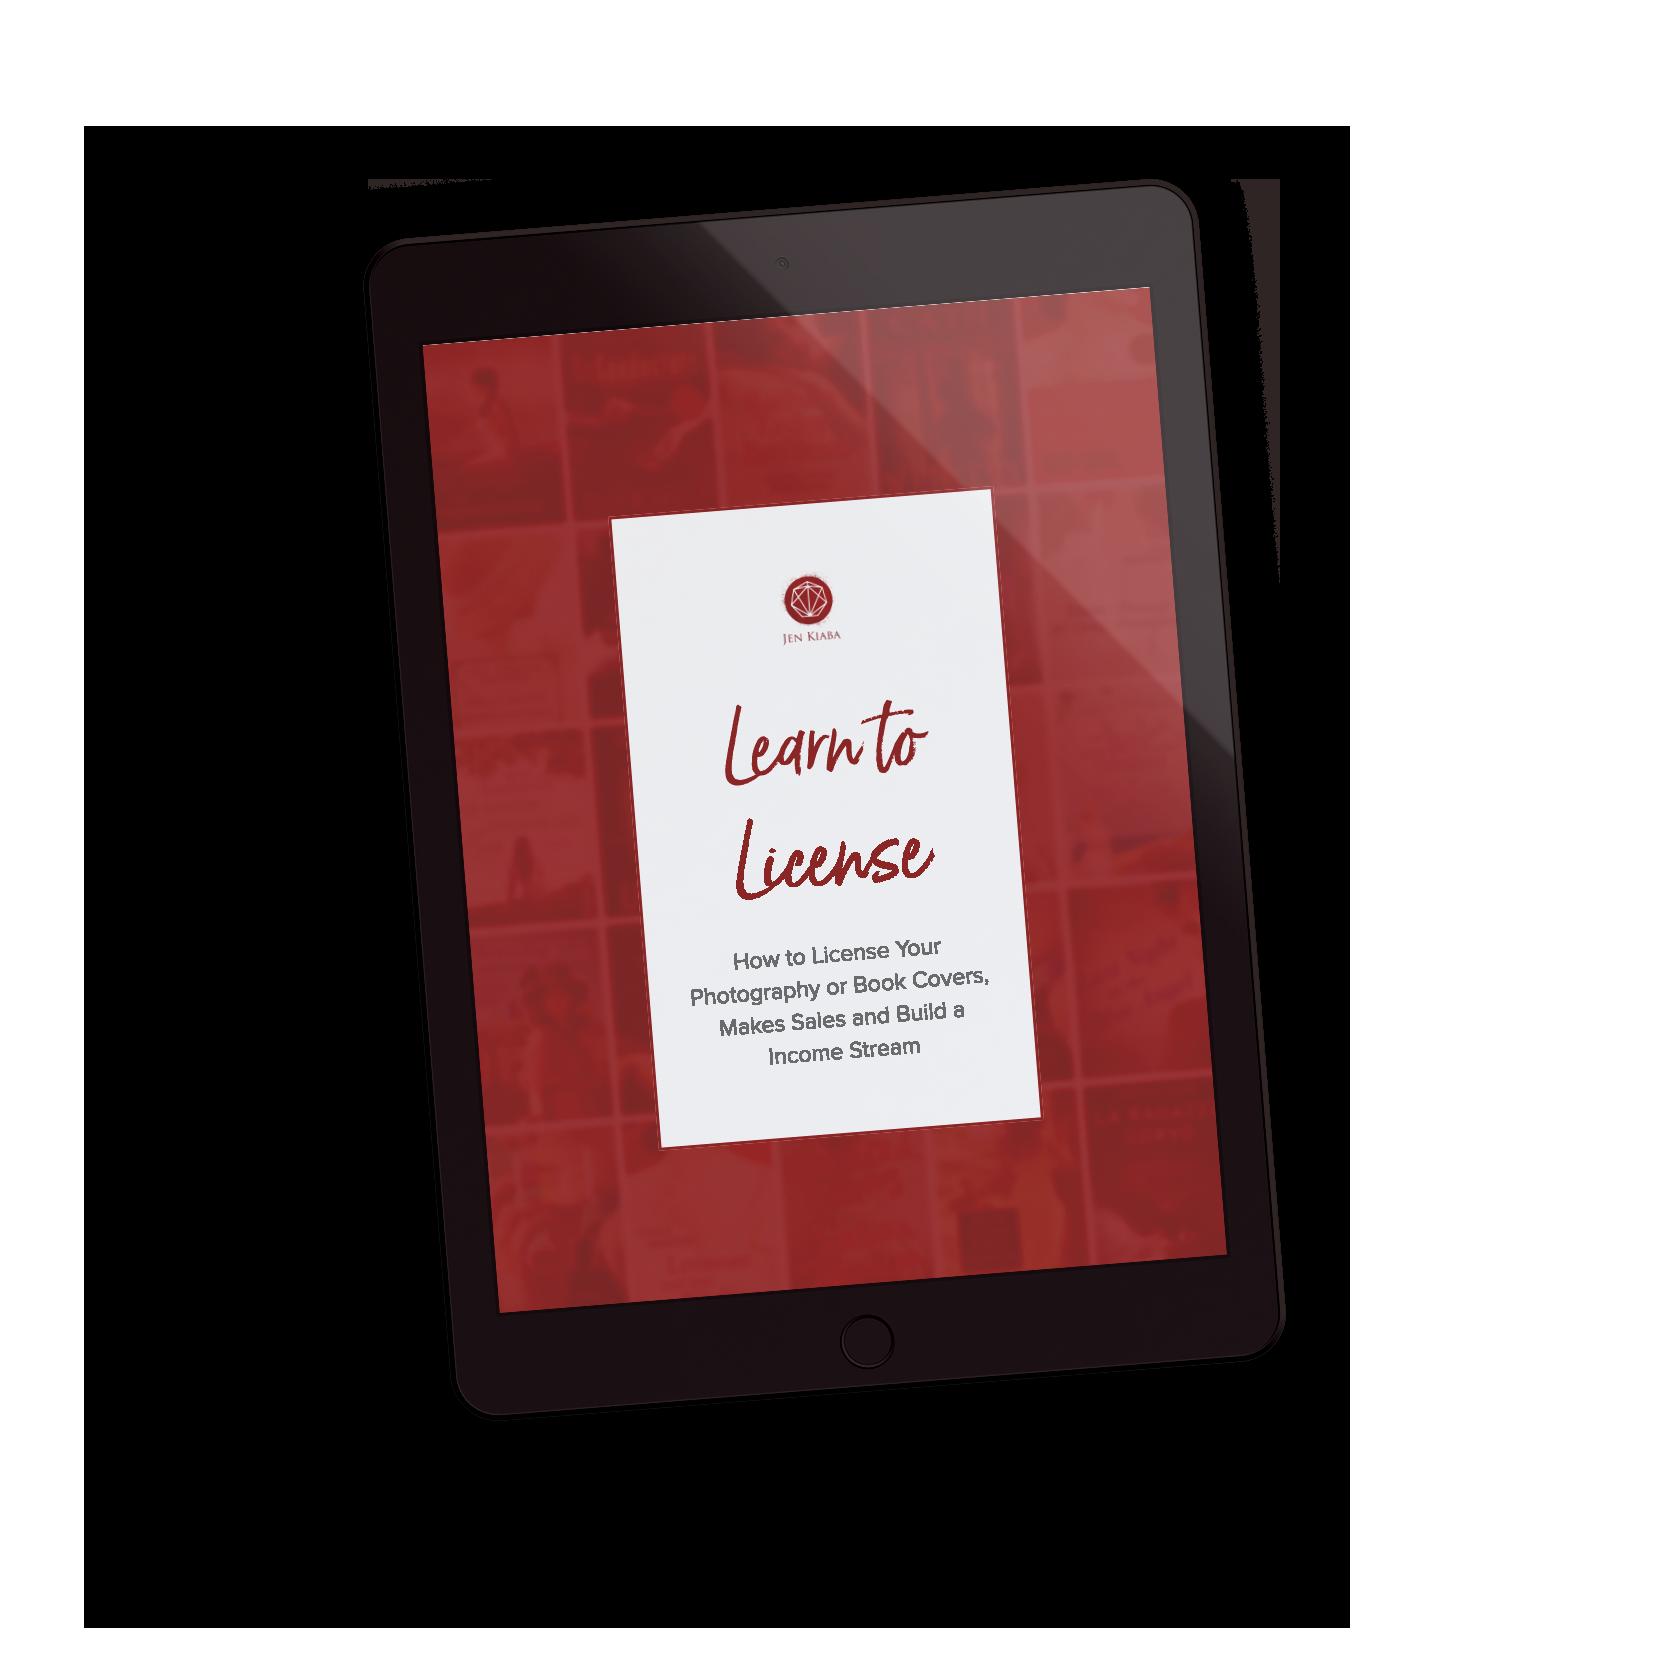 learn-to-license-workbook-ipad-mockup 03.png